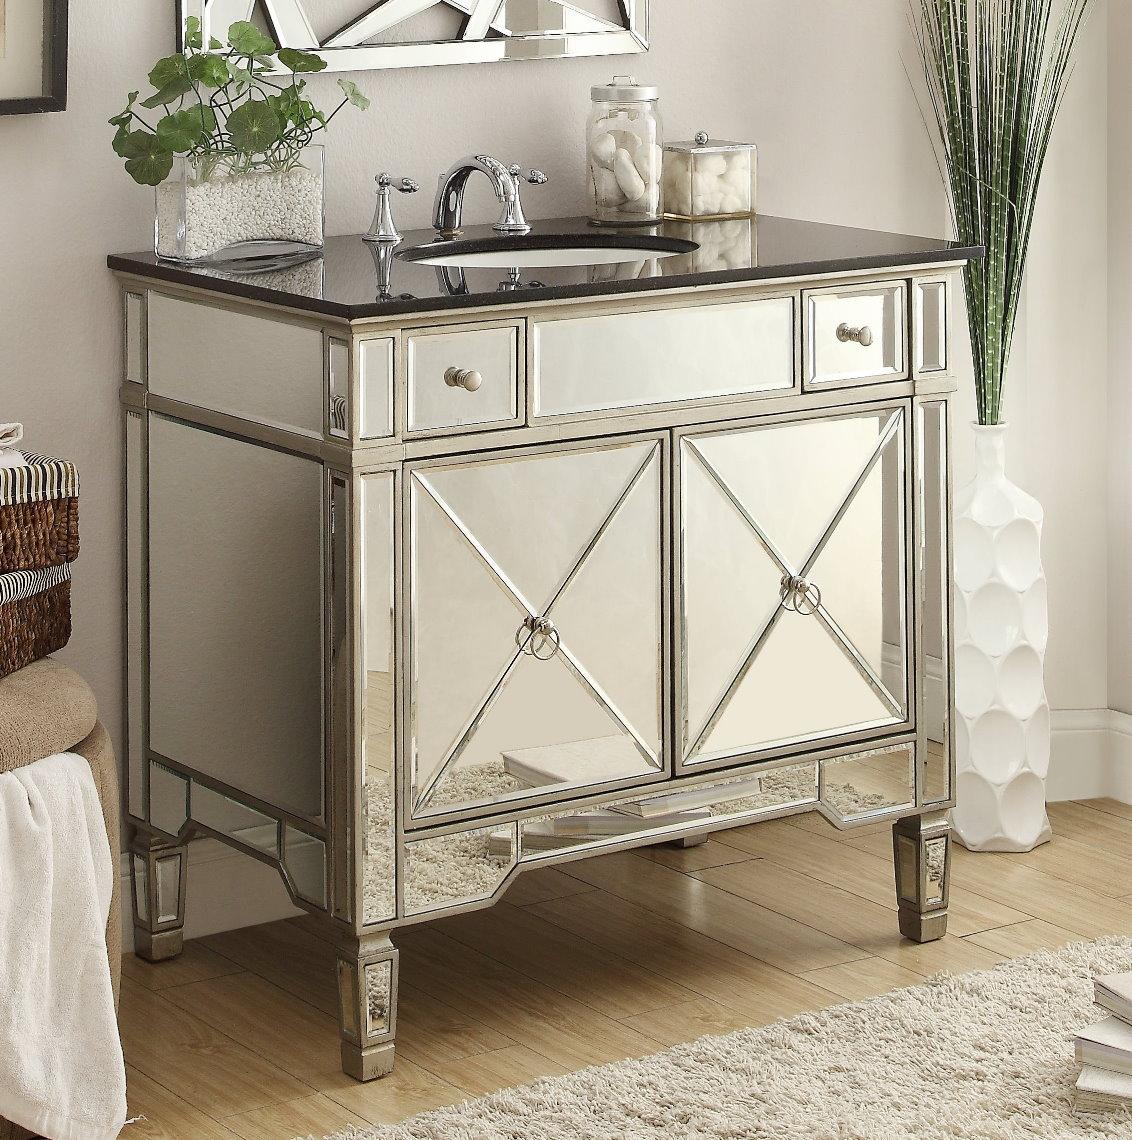 Bathroom Cabinet Mirrored adelina 36 inch mirrored silver bathroom vanity & mirror